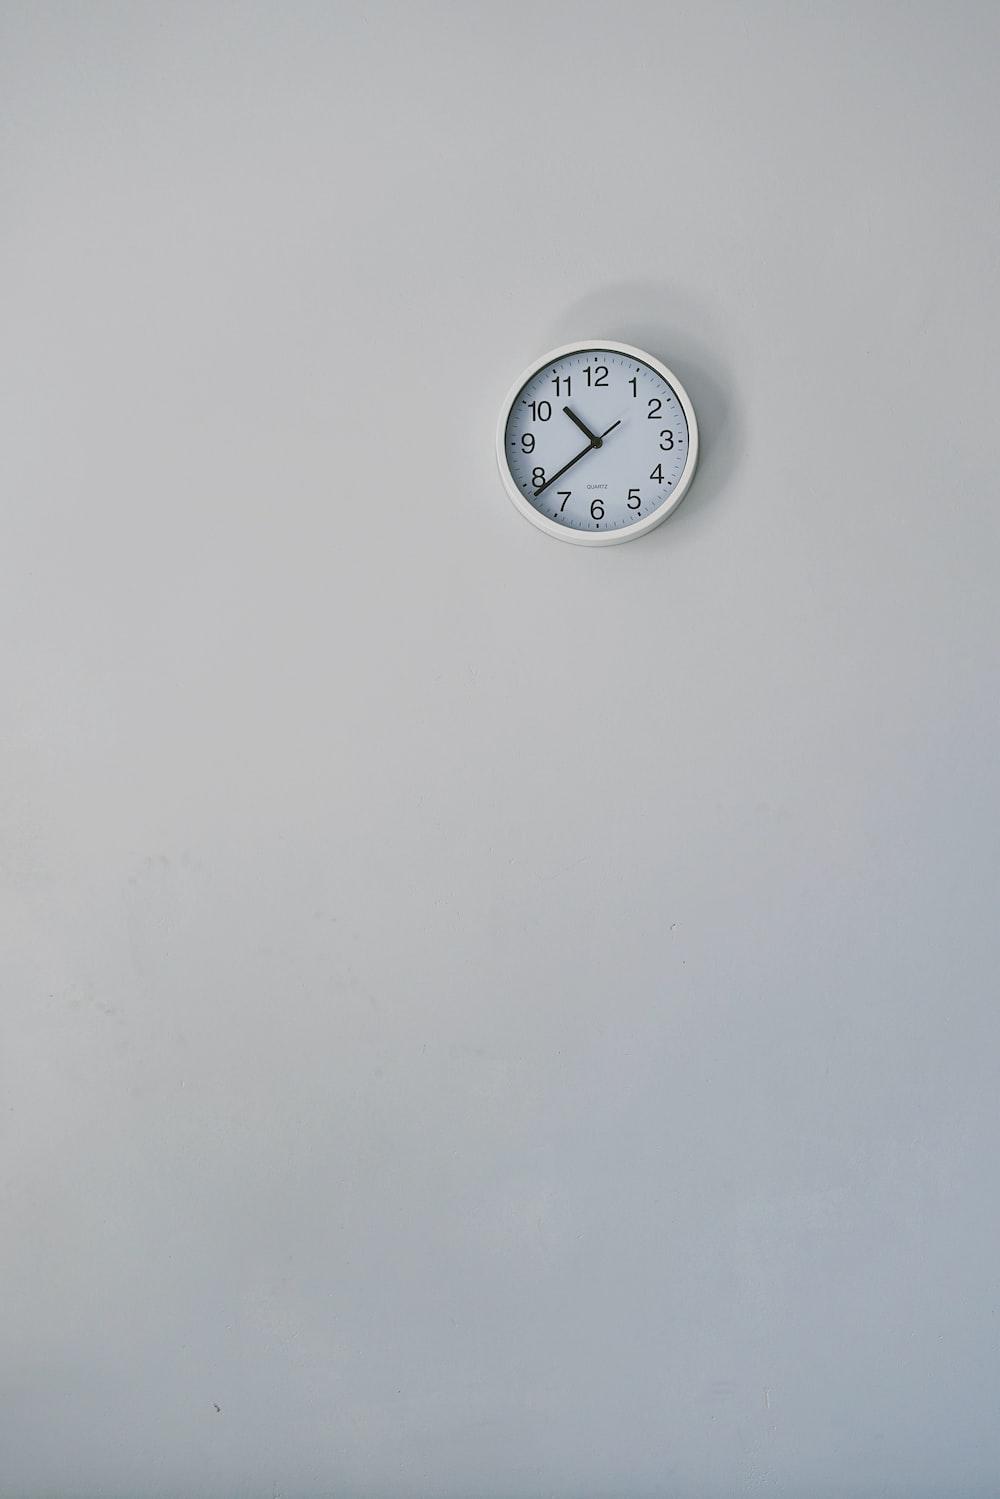 round white analog wall clock displaying 10:38